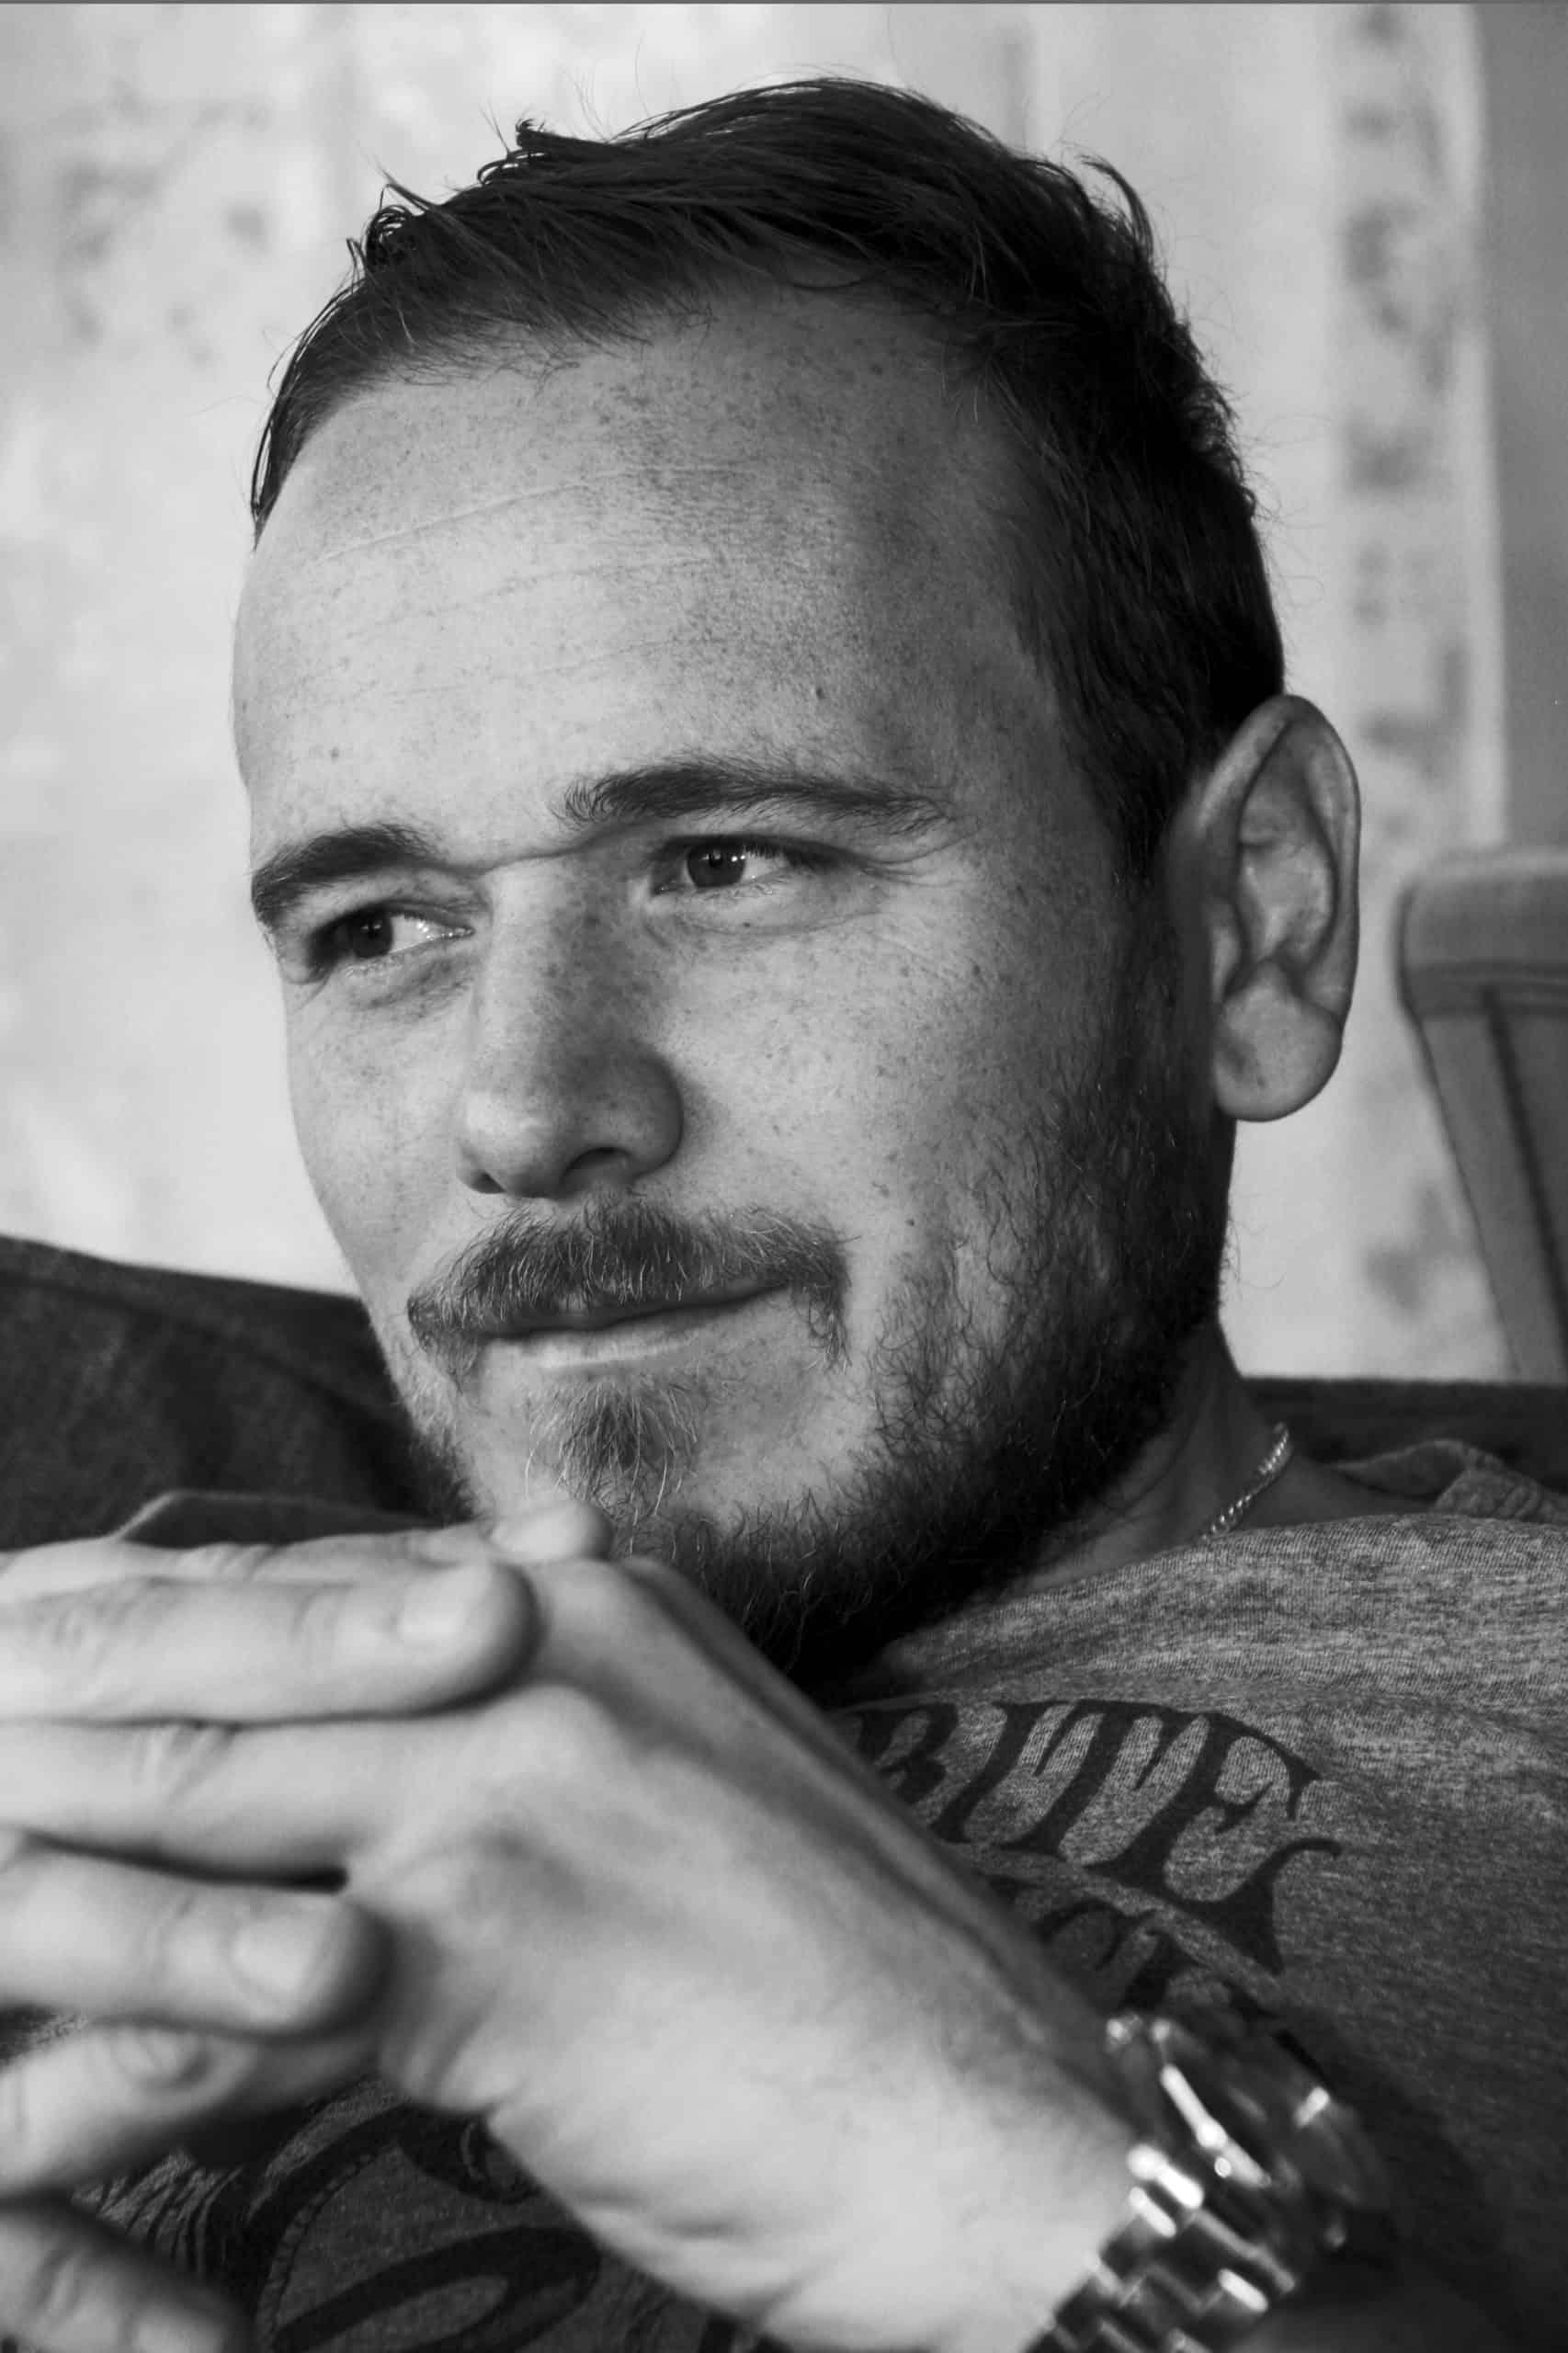 Kjell-Vidar Åhman Teig - Music Is Everywhere